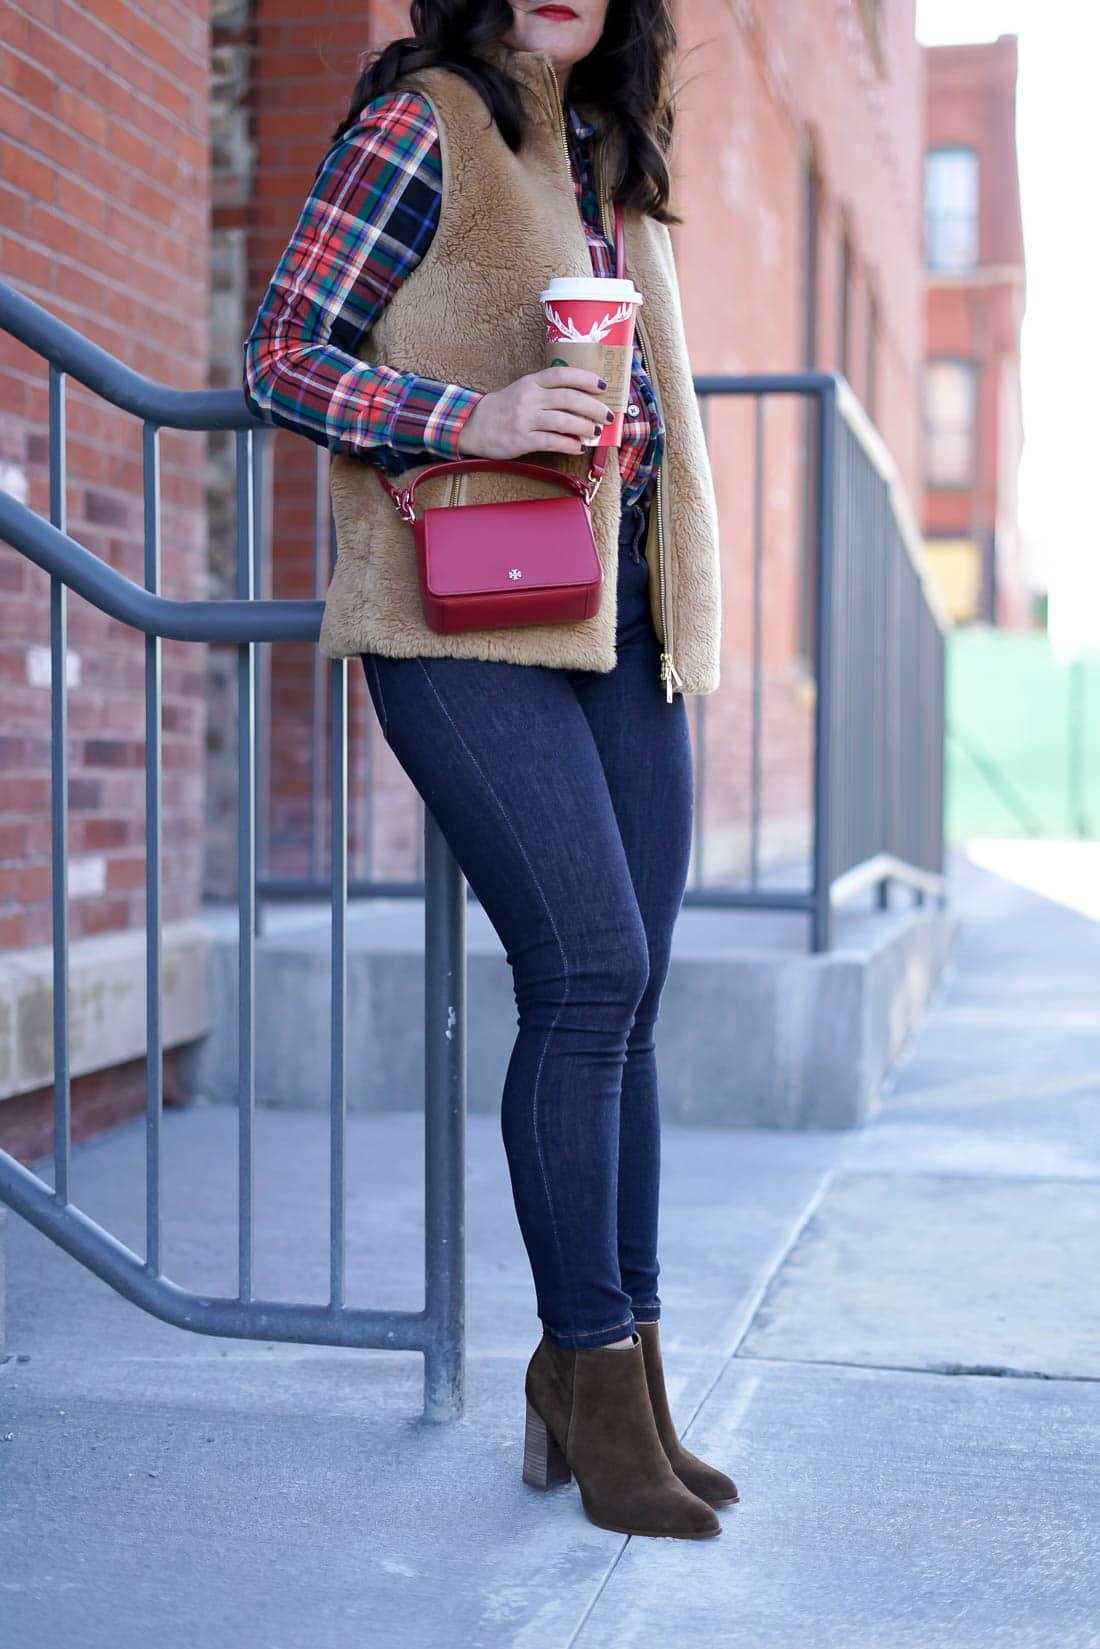 Welcome 2017, J.Crew Camel Vest, A Lily Love Affair, Banana Republic Plaid Top, Chicago Blogger, Fall Fashion, Red Tory Burch Cross Body Bag